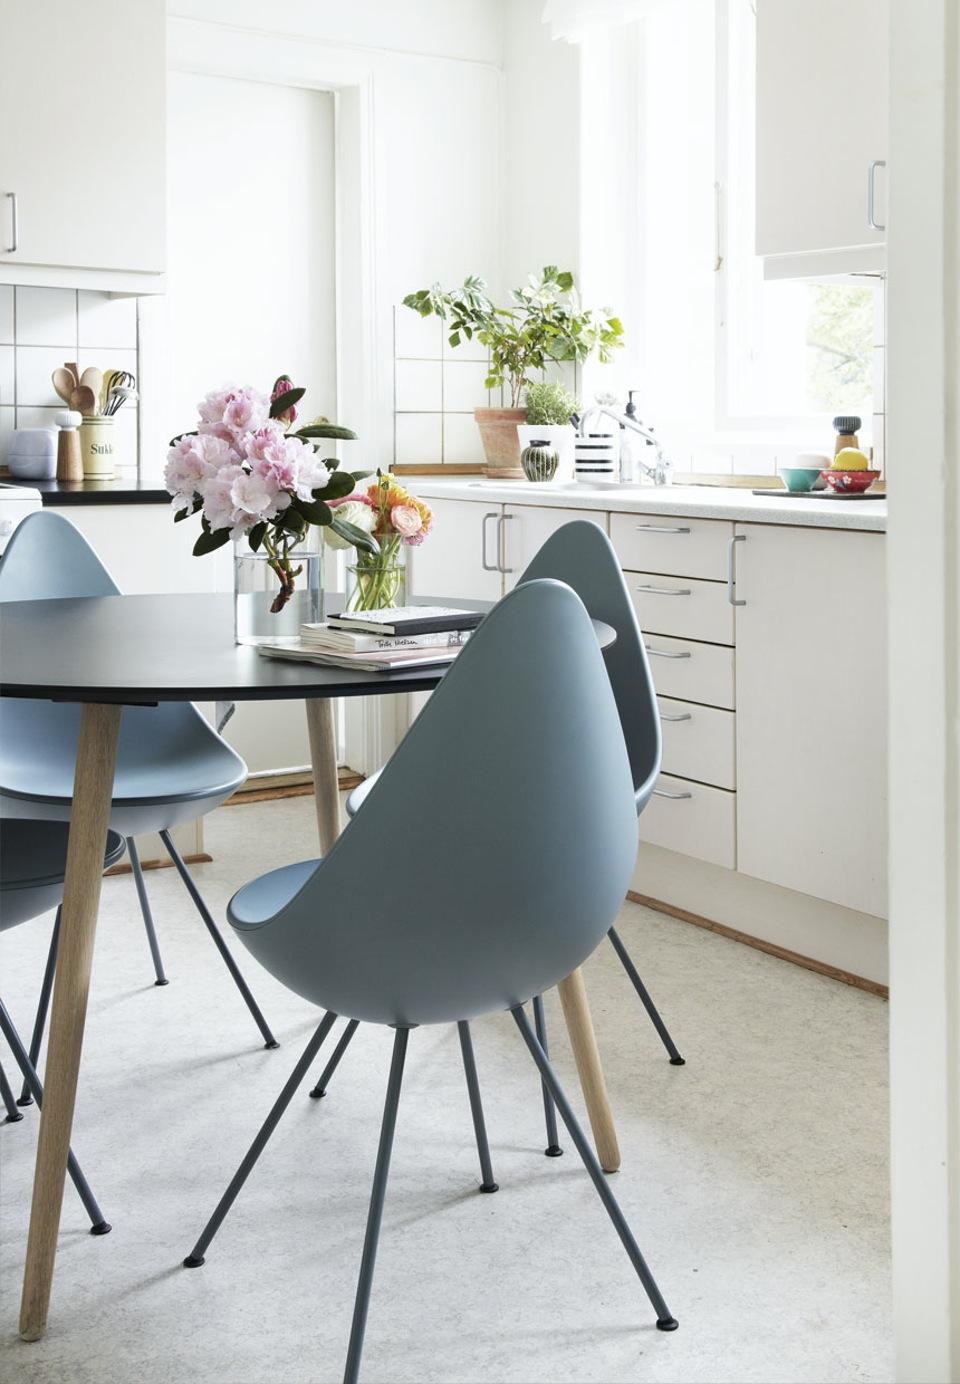 Comment adopter une d co pastel scandinave for Deco interieur scandinave